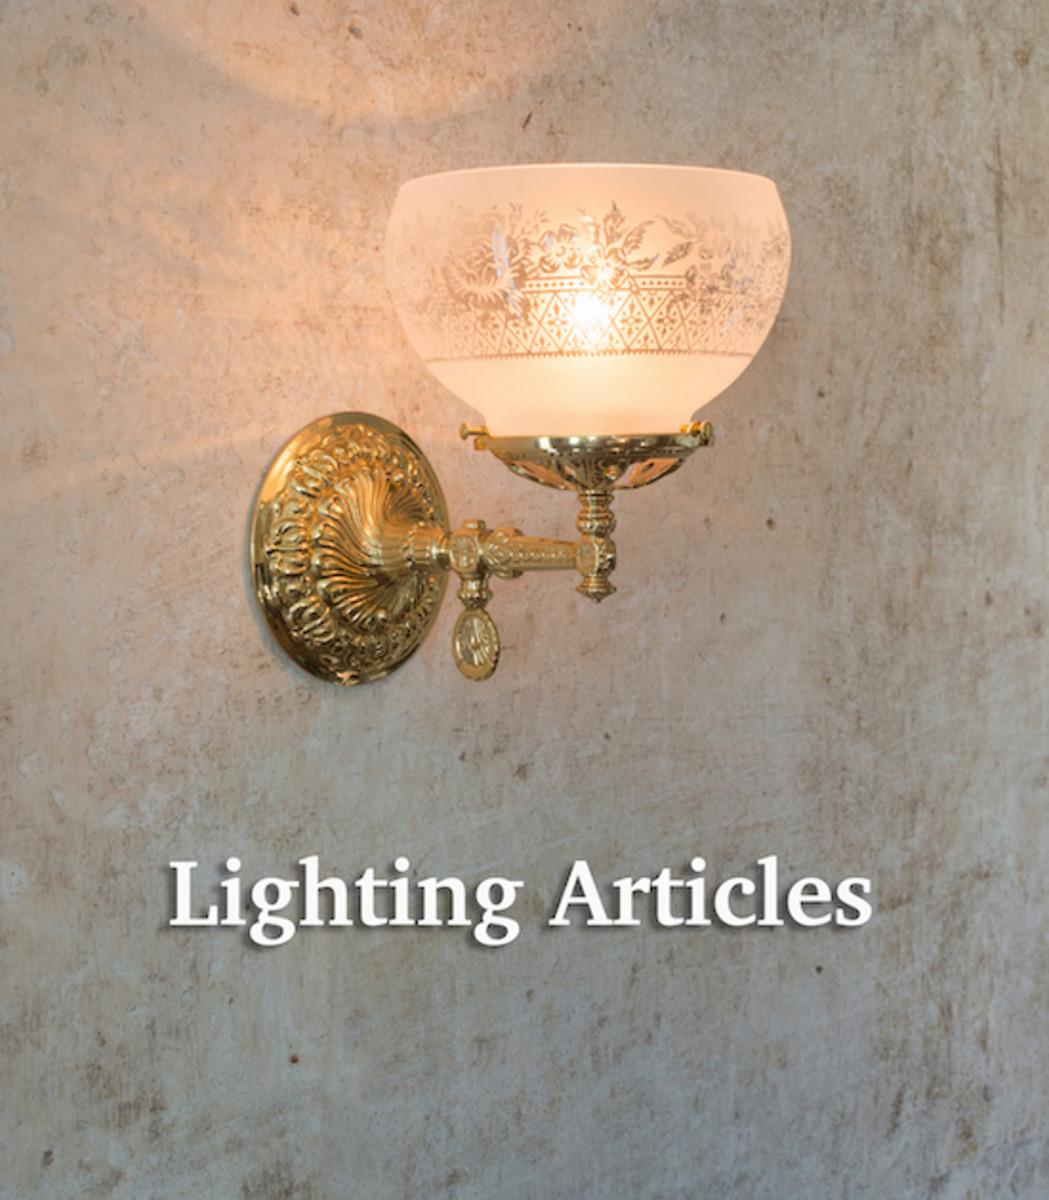 v3TSM_VictorianLightingWorks_KindraClineff_8015 copy 3